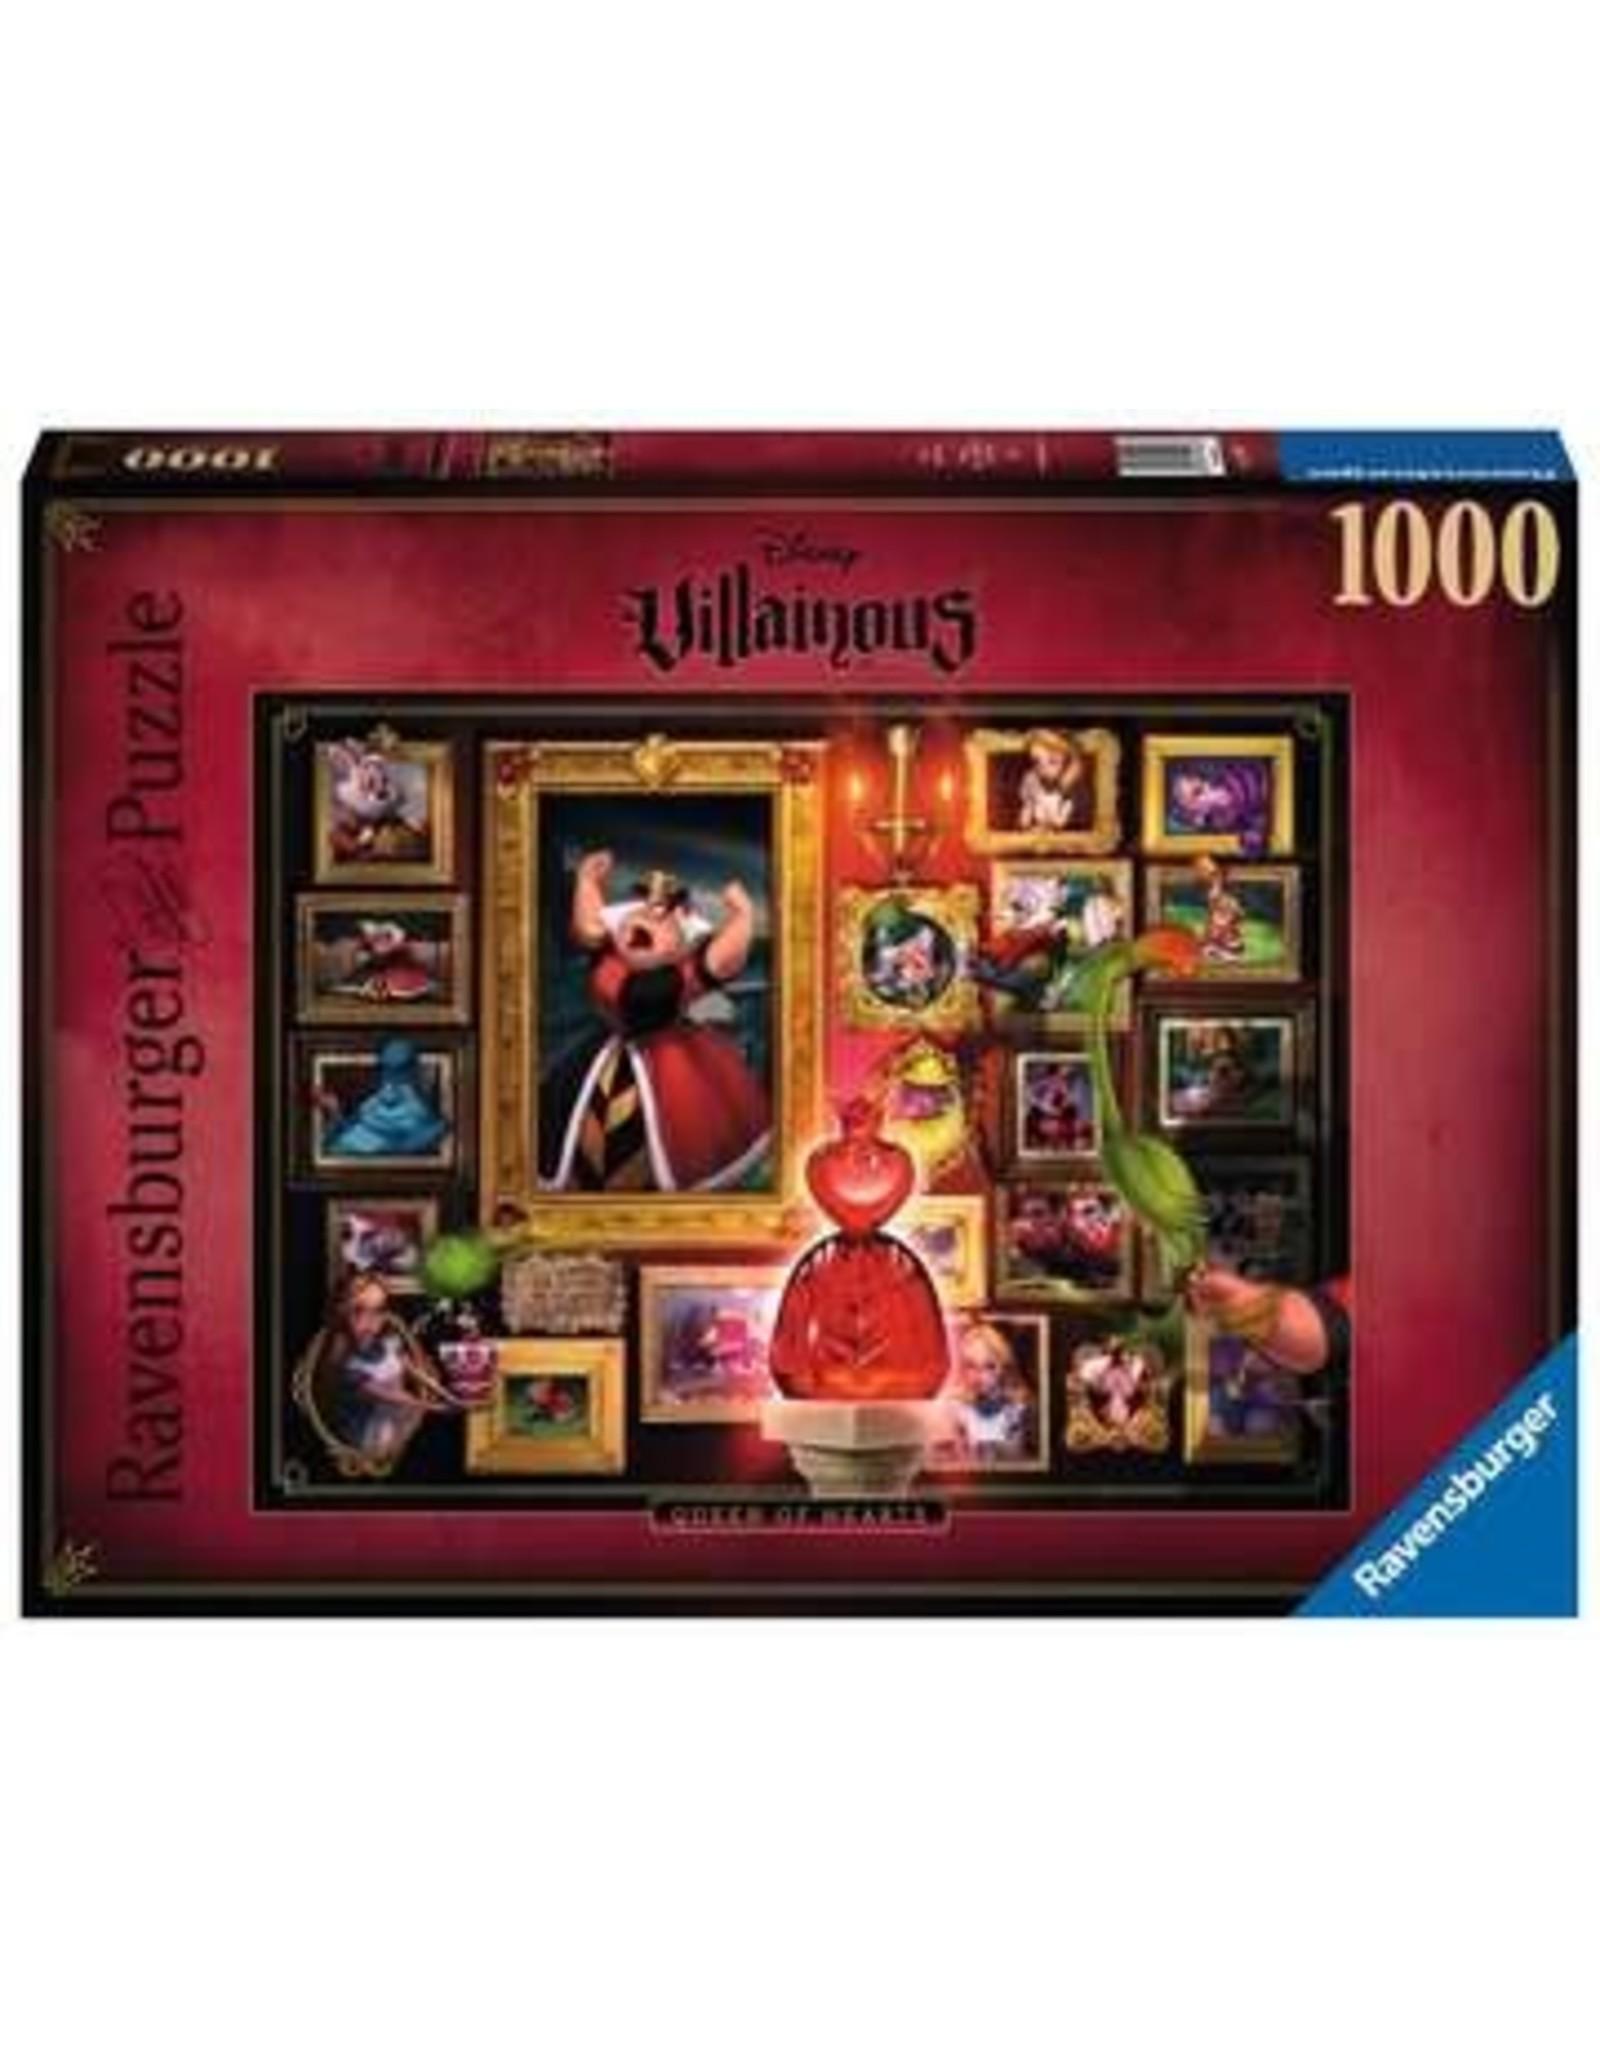 Ravensburger Disney Villainous Queen of Hearts, 1000pc